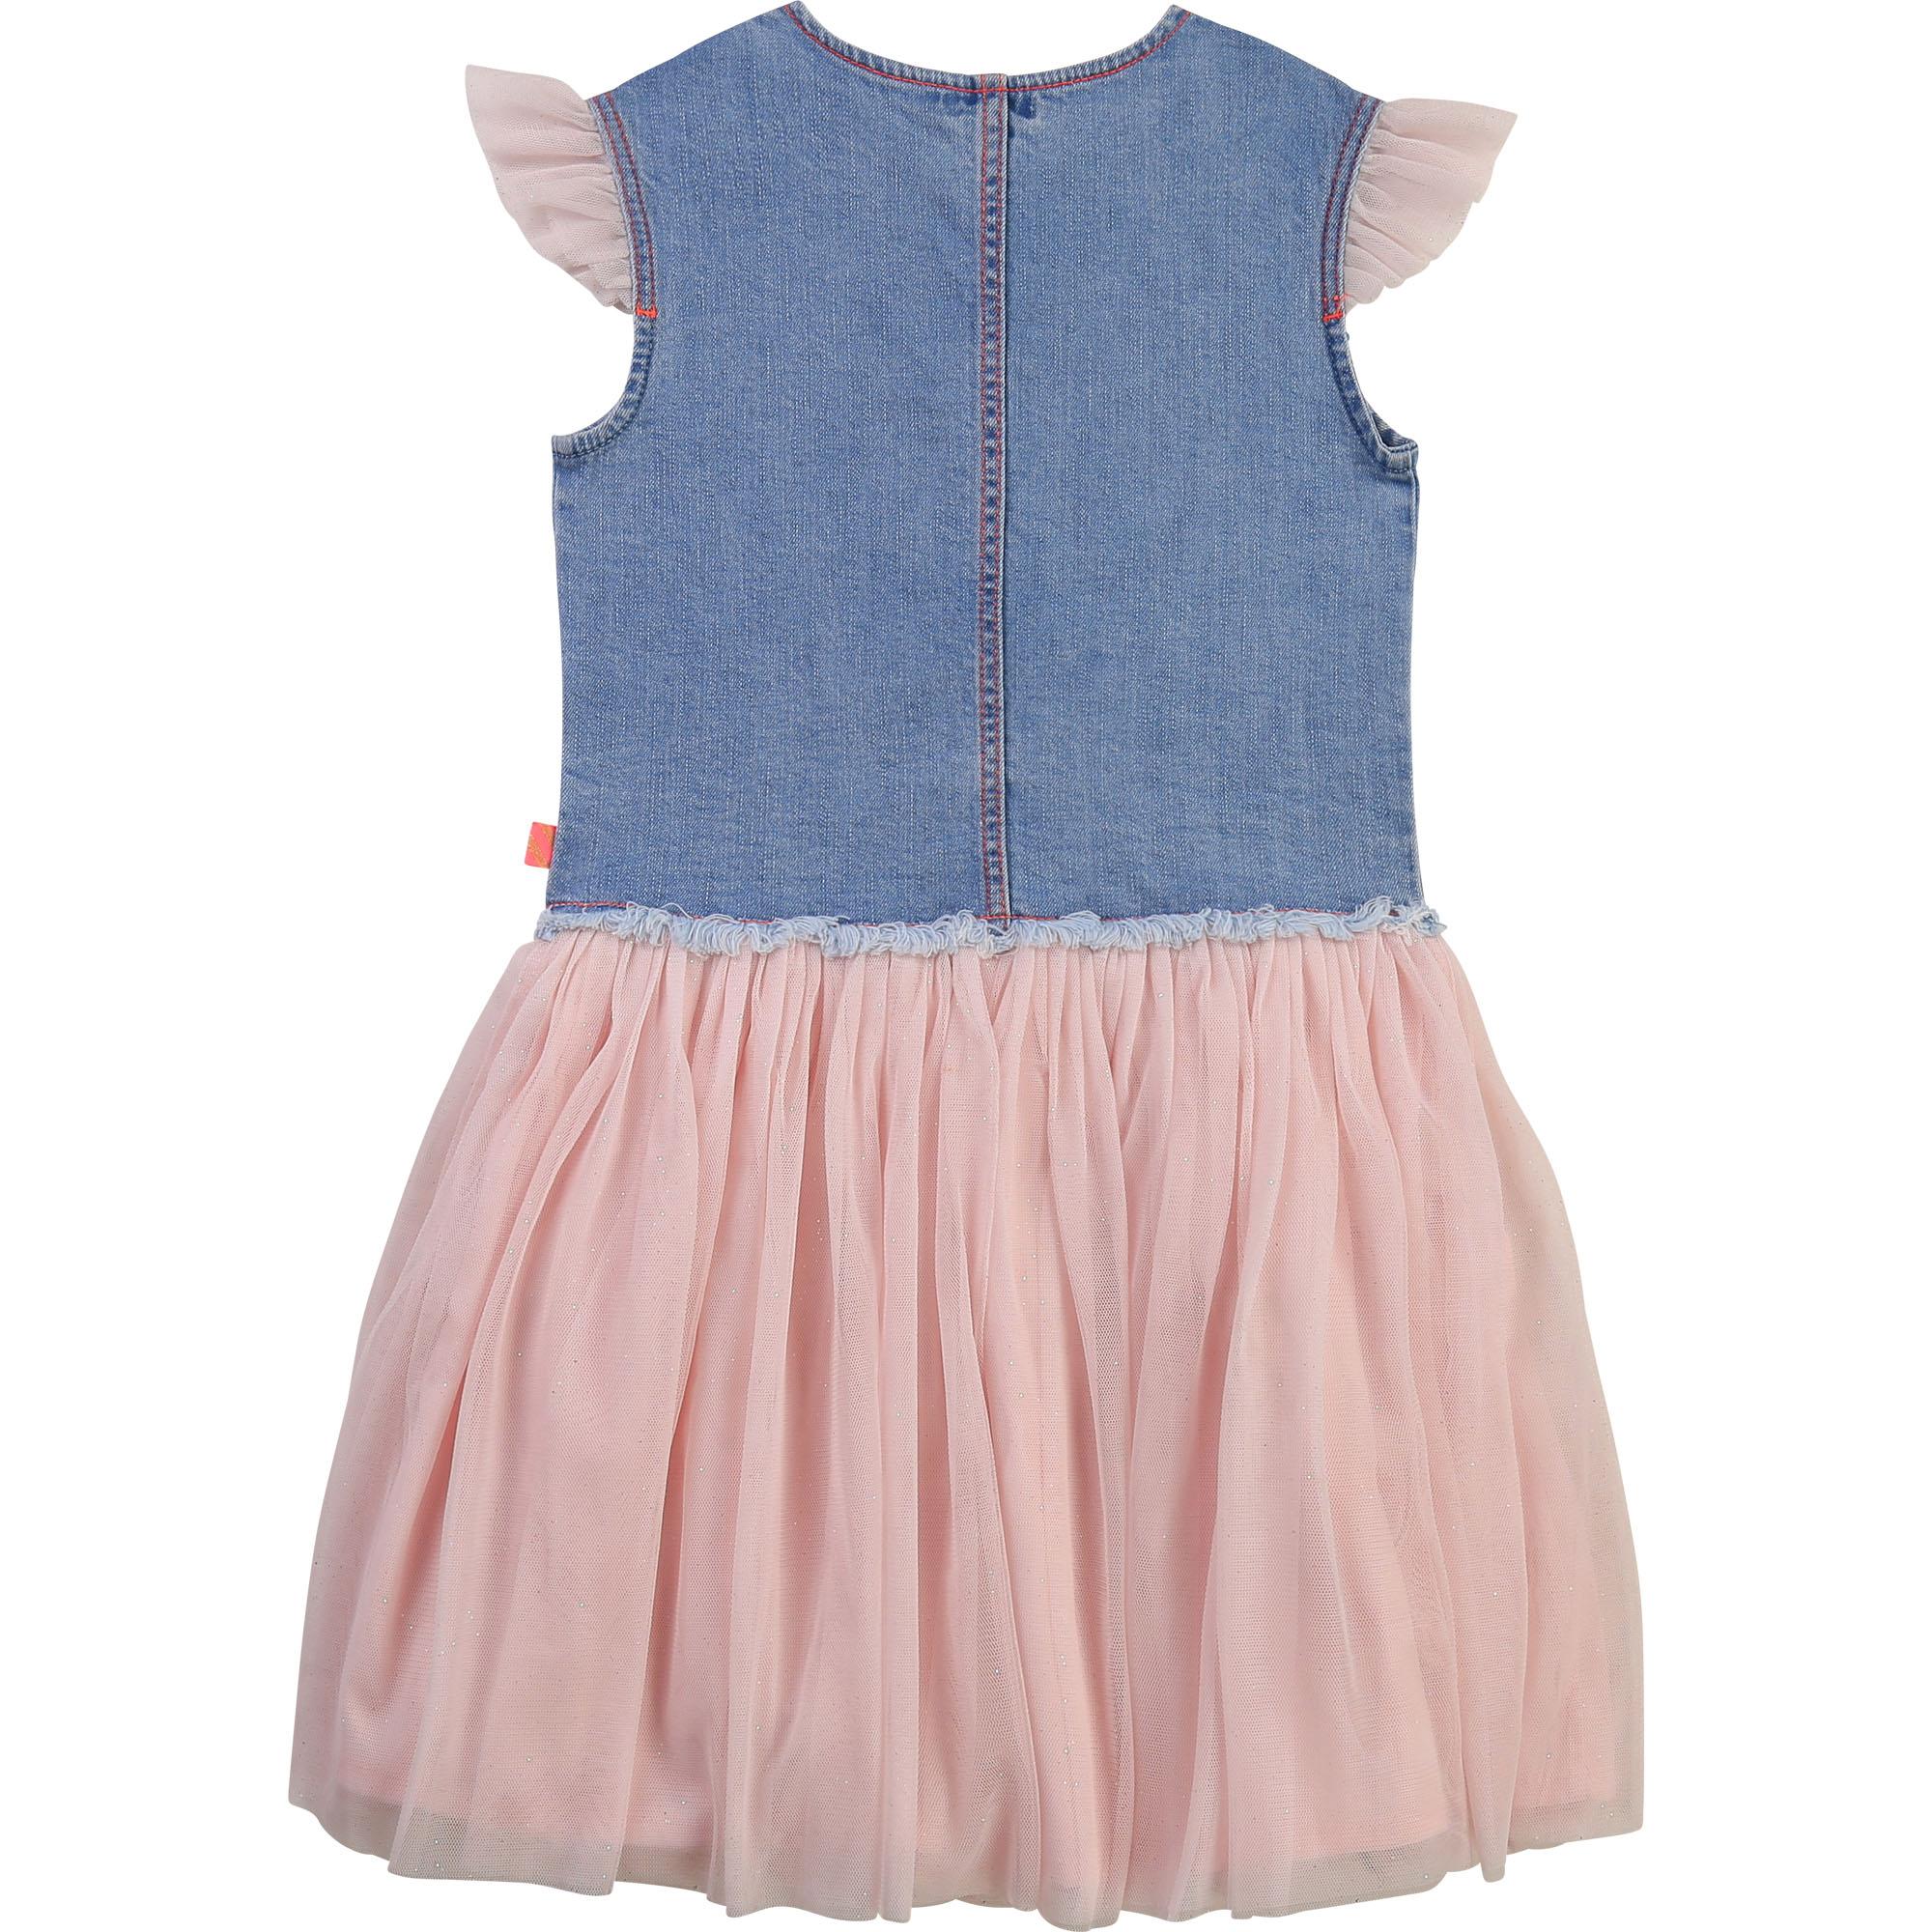 Lined denim and tulle dress BILLIEBLUSH for GIRL